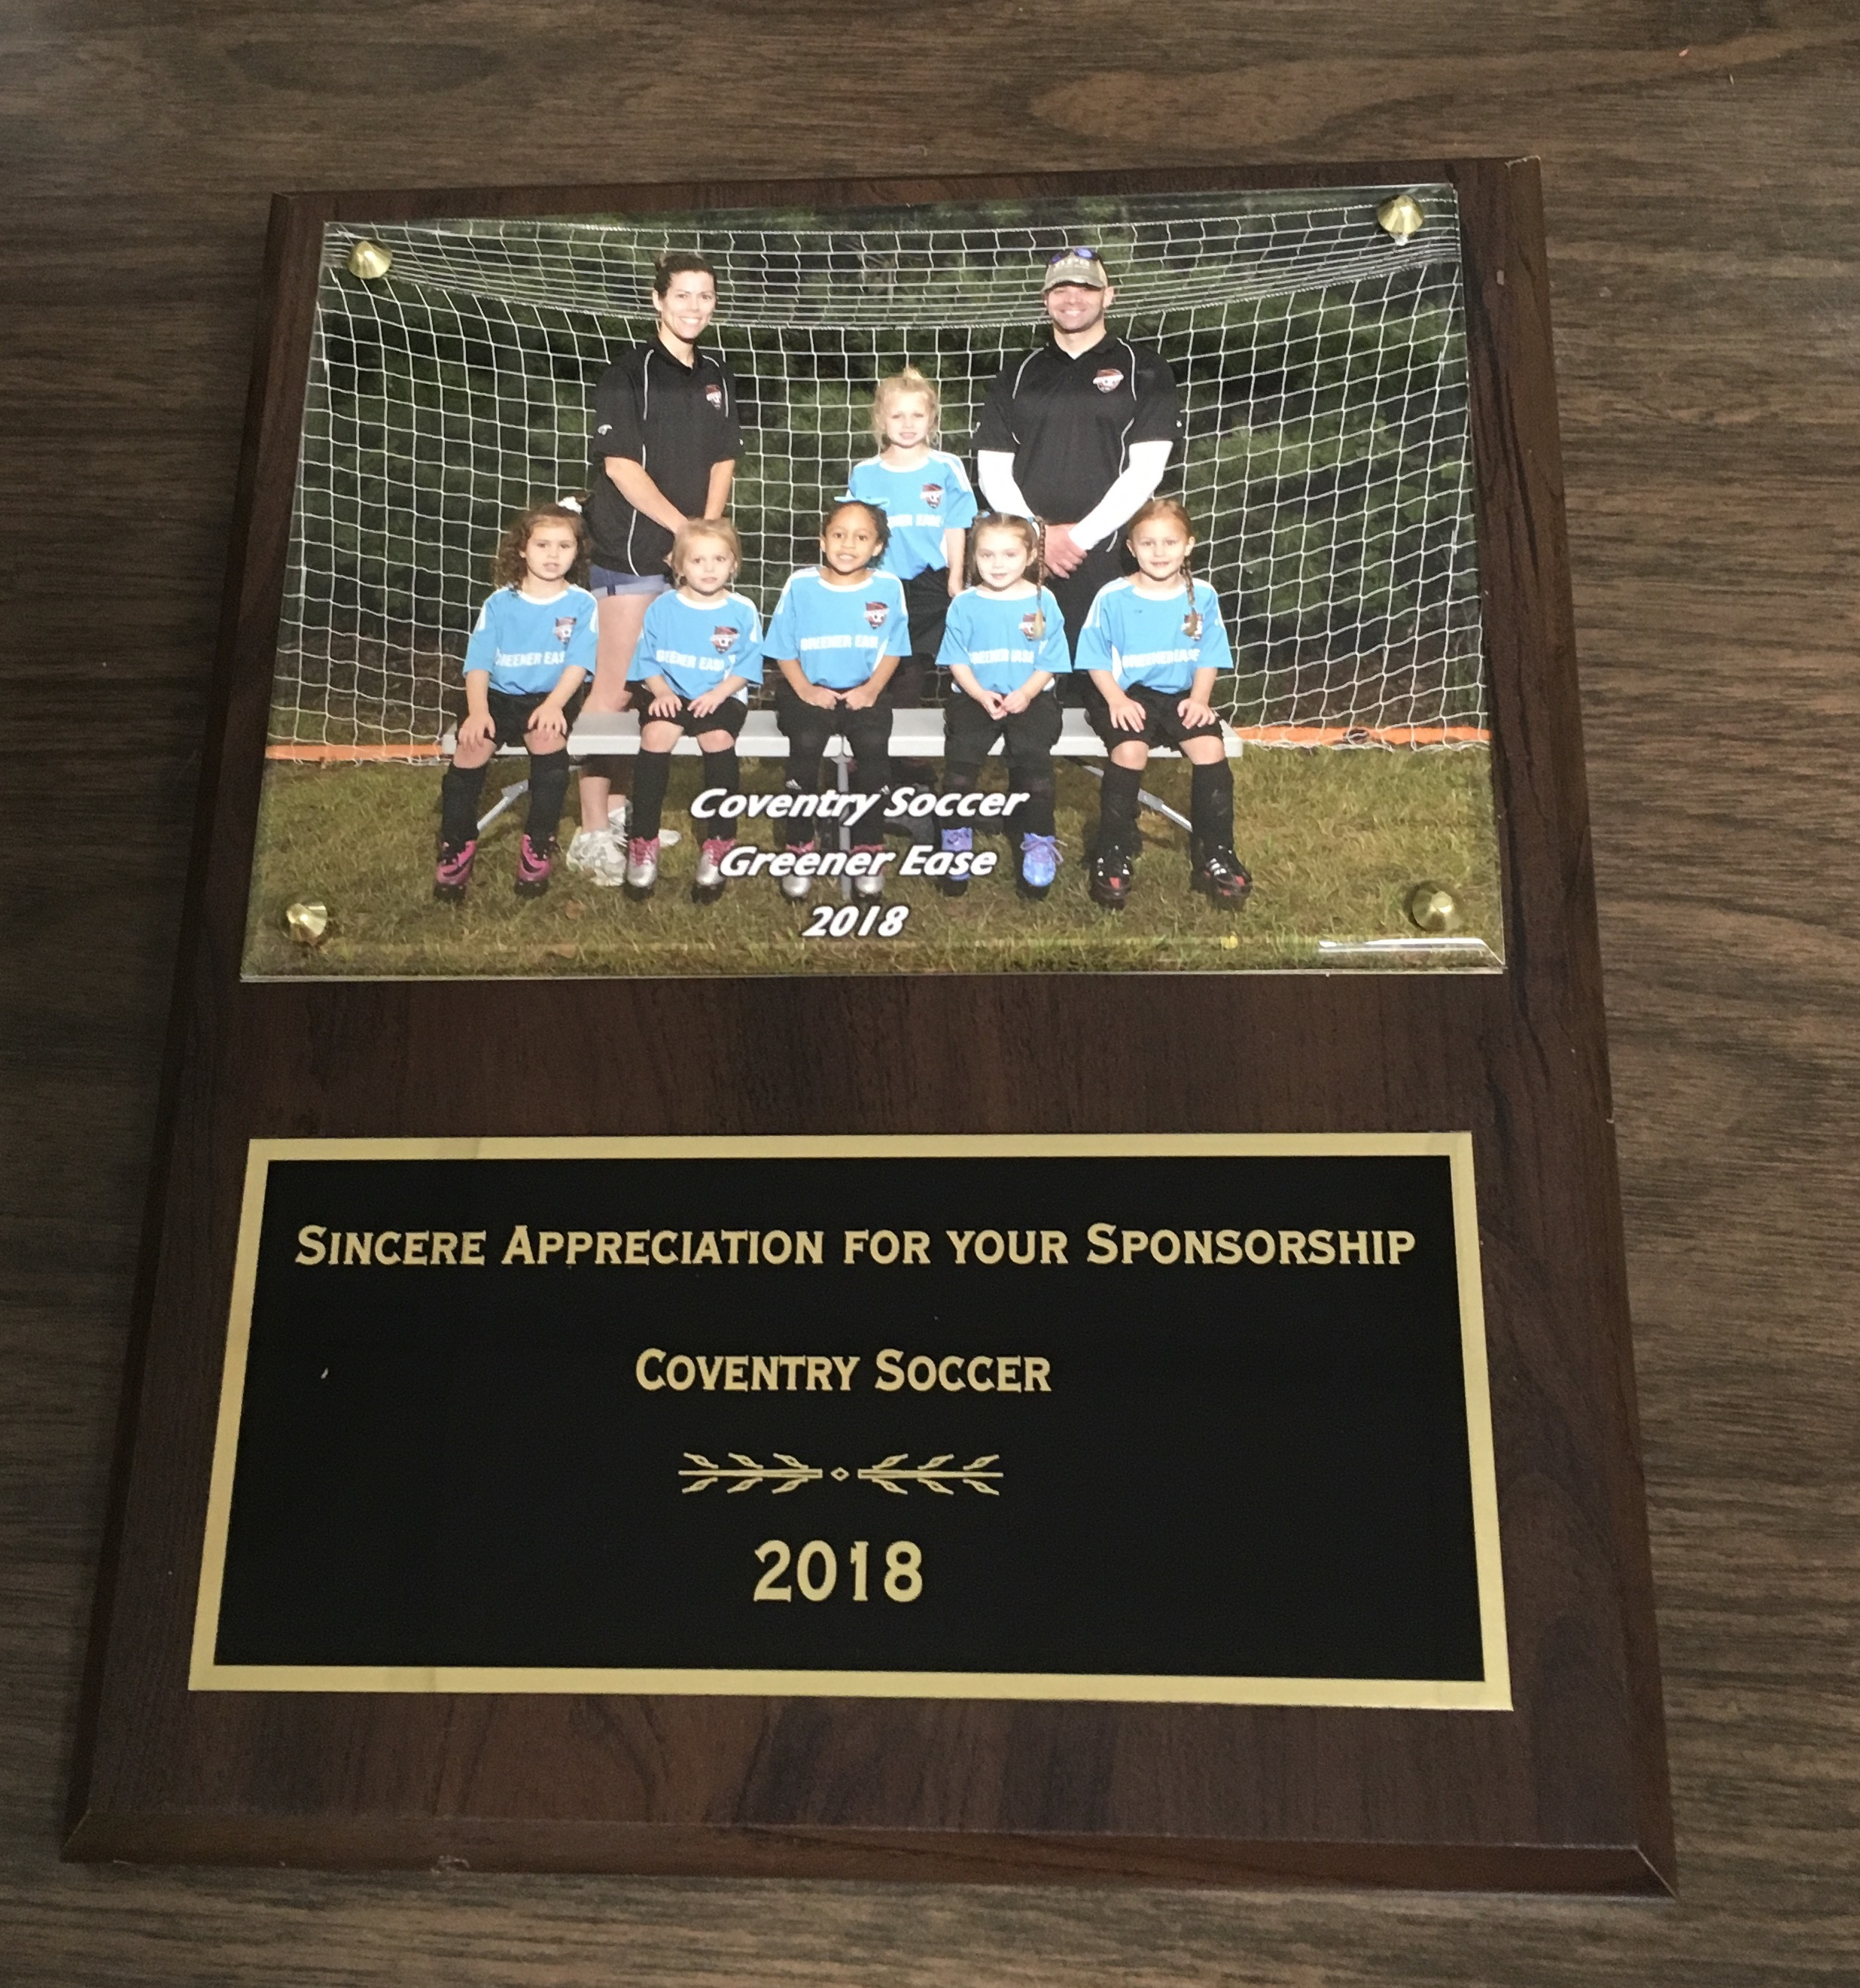 Coventry Soccer - 2018